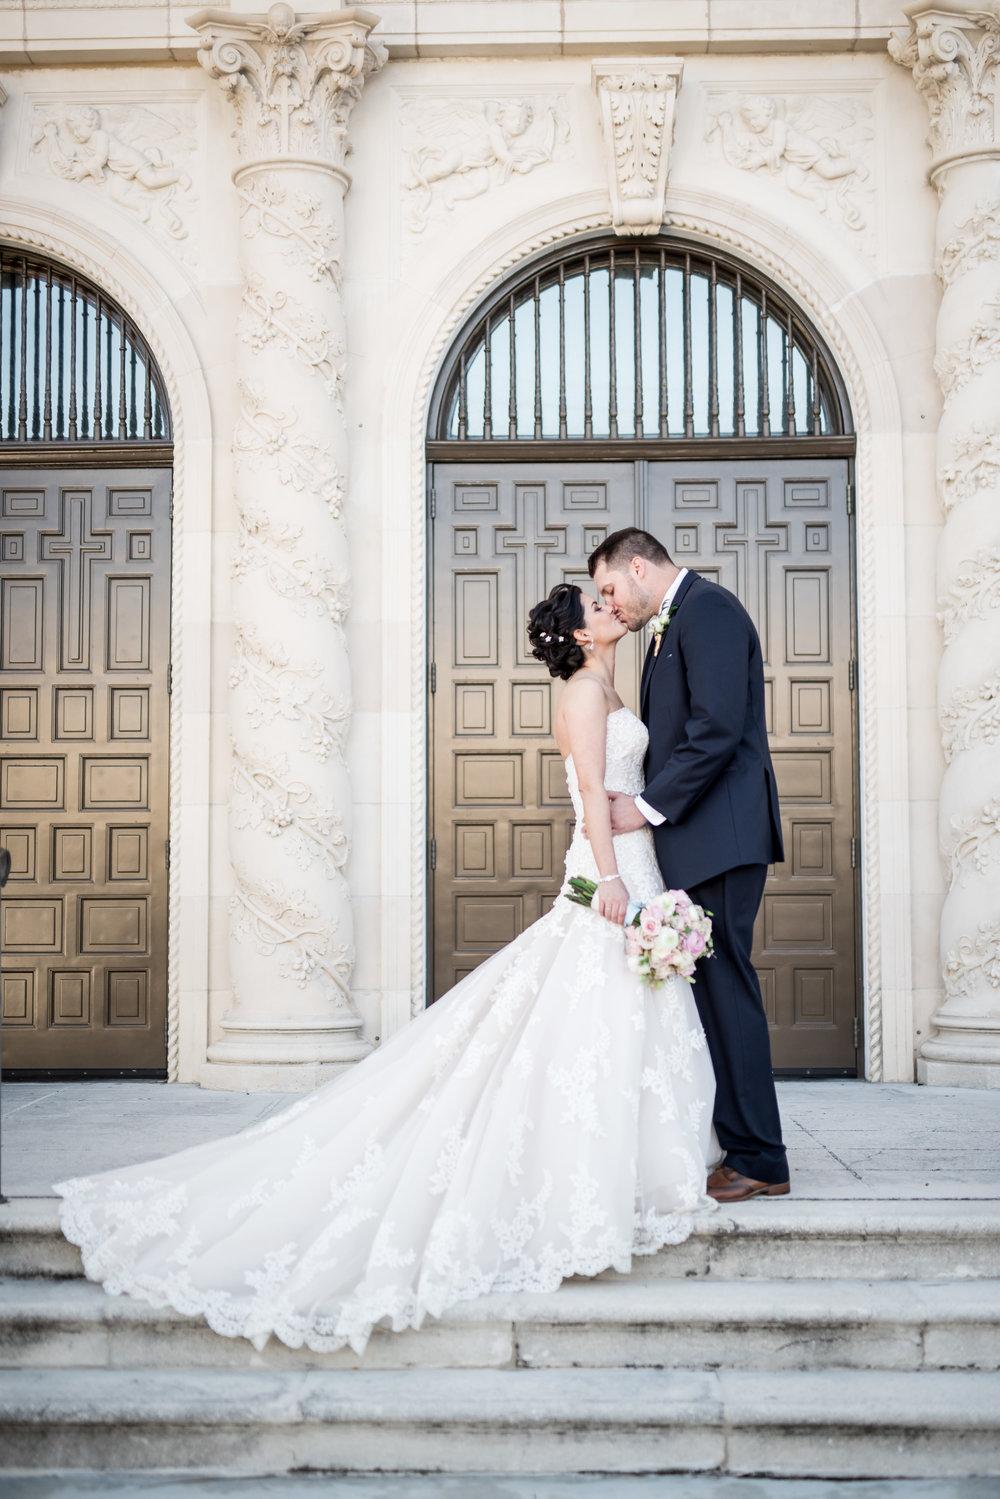 Sabrina & Anthony Wedding | Highlights-0107.jpg